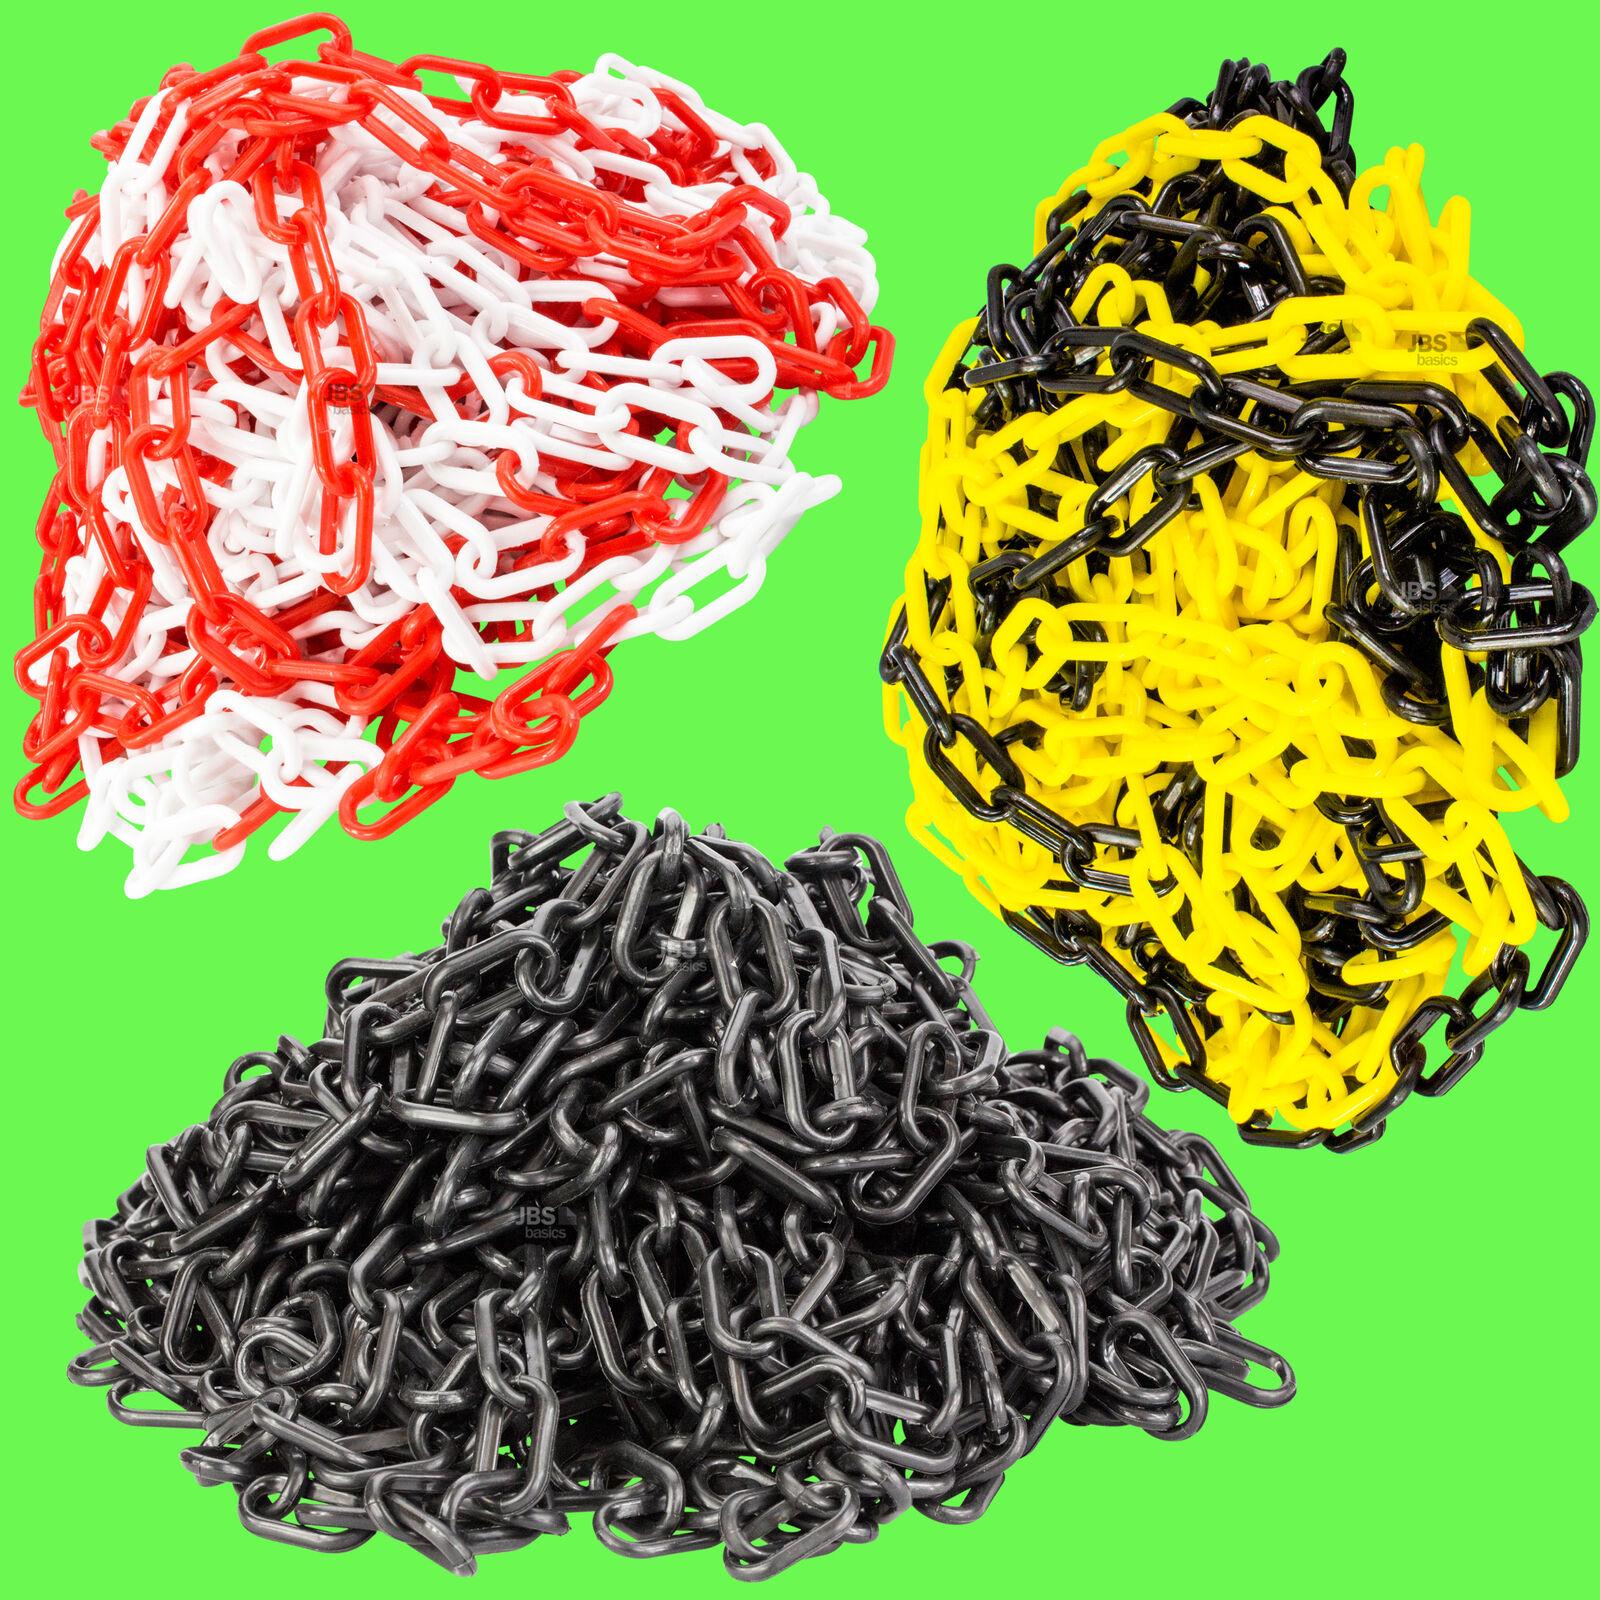 ► Absperrkette 30 25 10 m Meter gelb schwarz rot 6mm Warnkette Kunststoff Kette